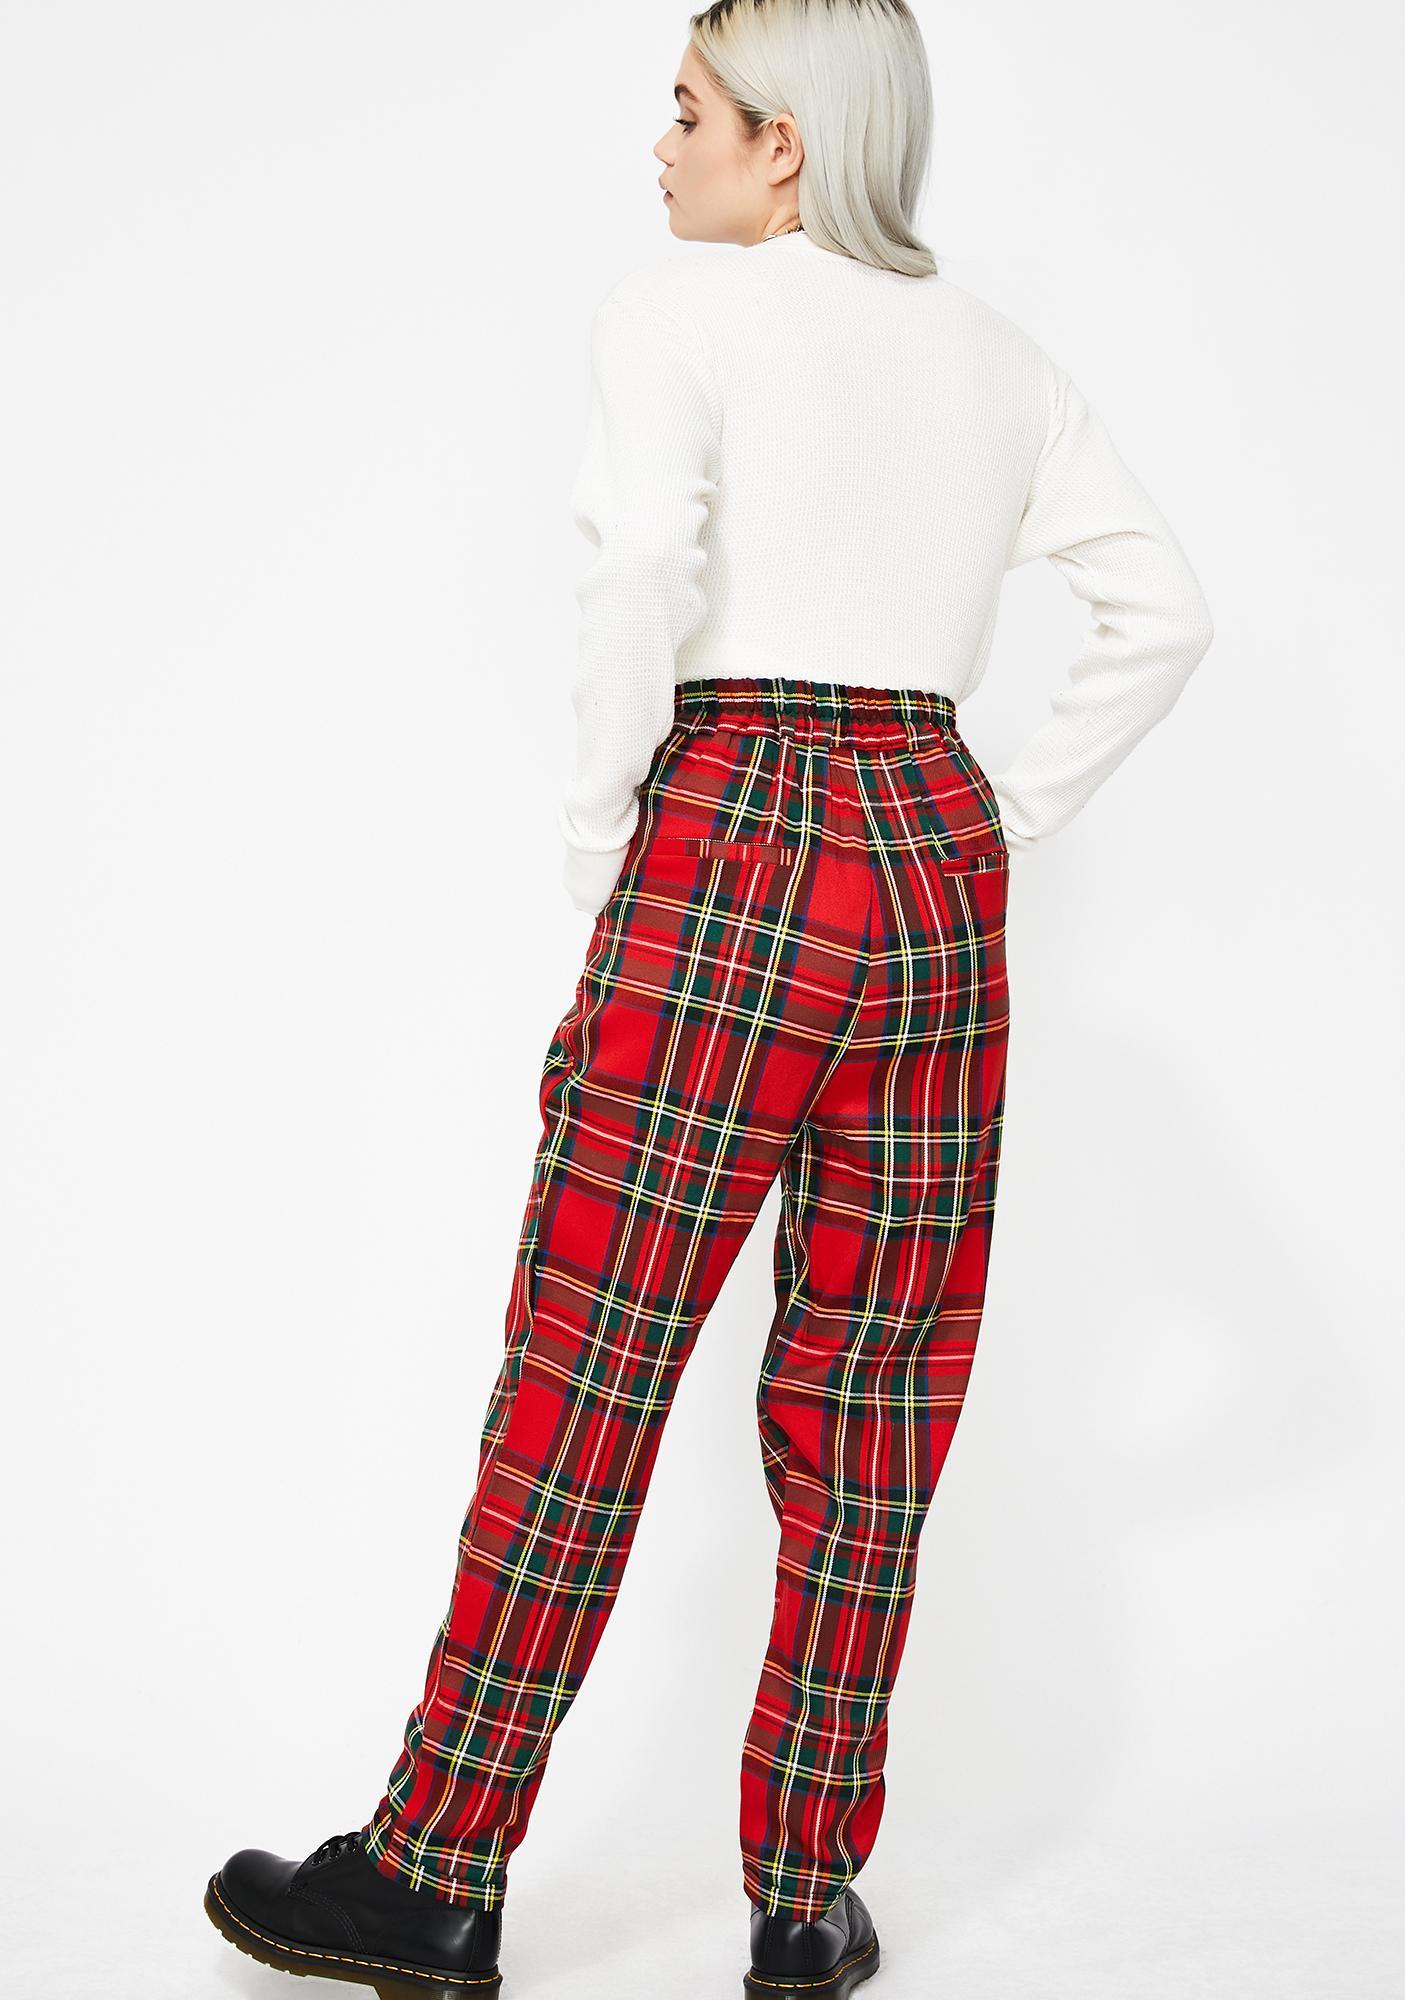 Rebel Instinct Plaid Pants